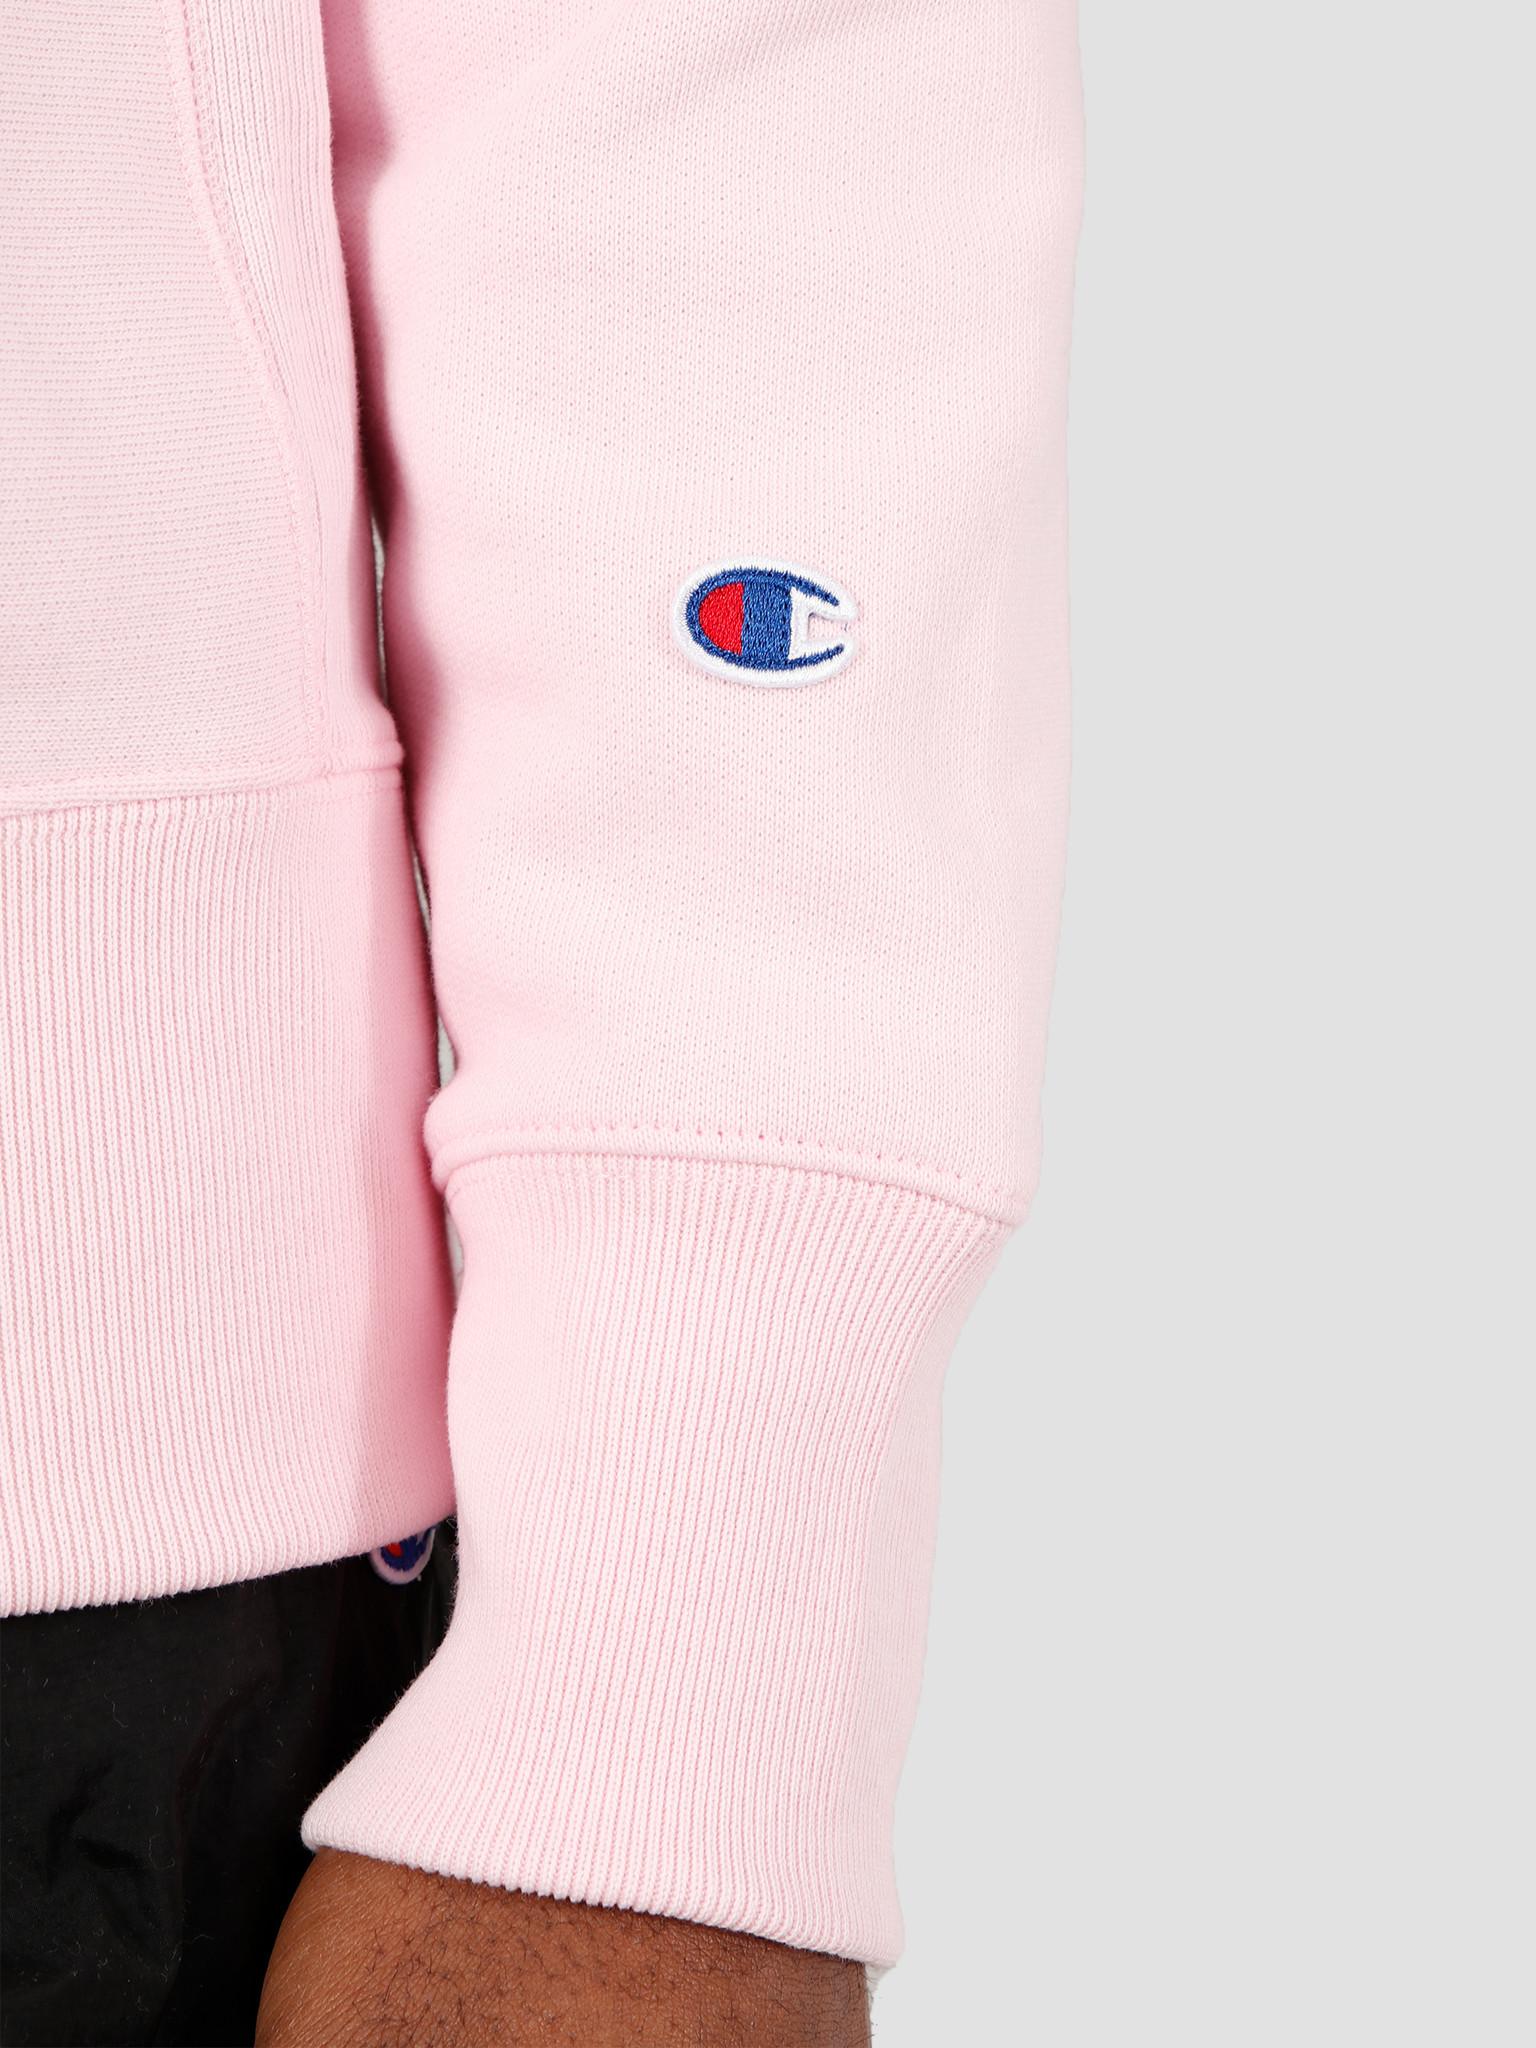 Champion Champion Crewneck Sweatshirt Pink BAP 214676-PS104